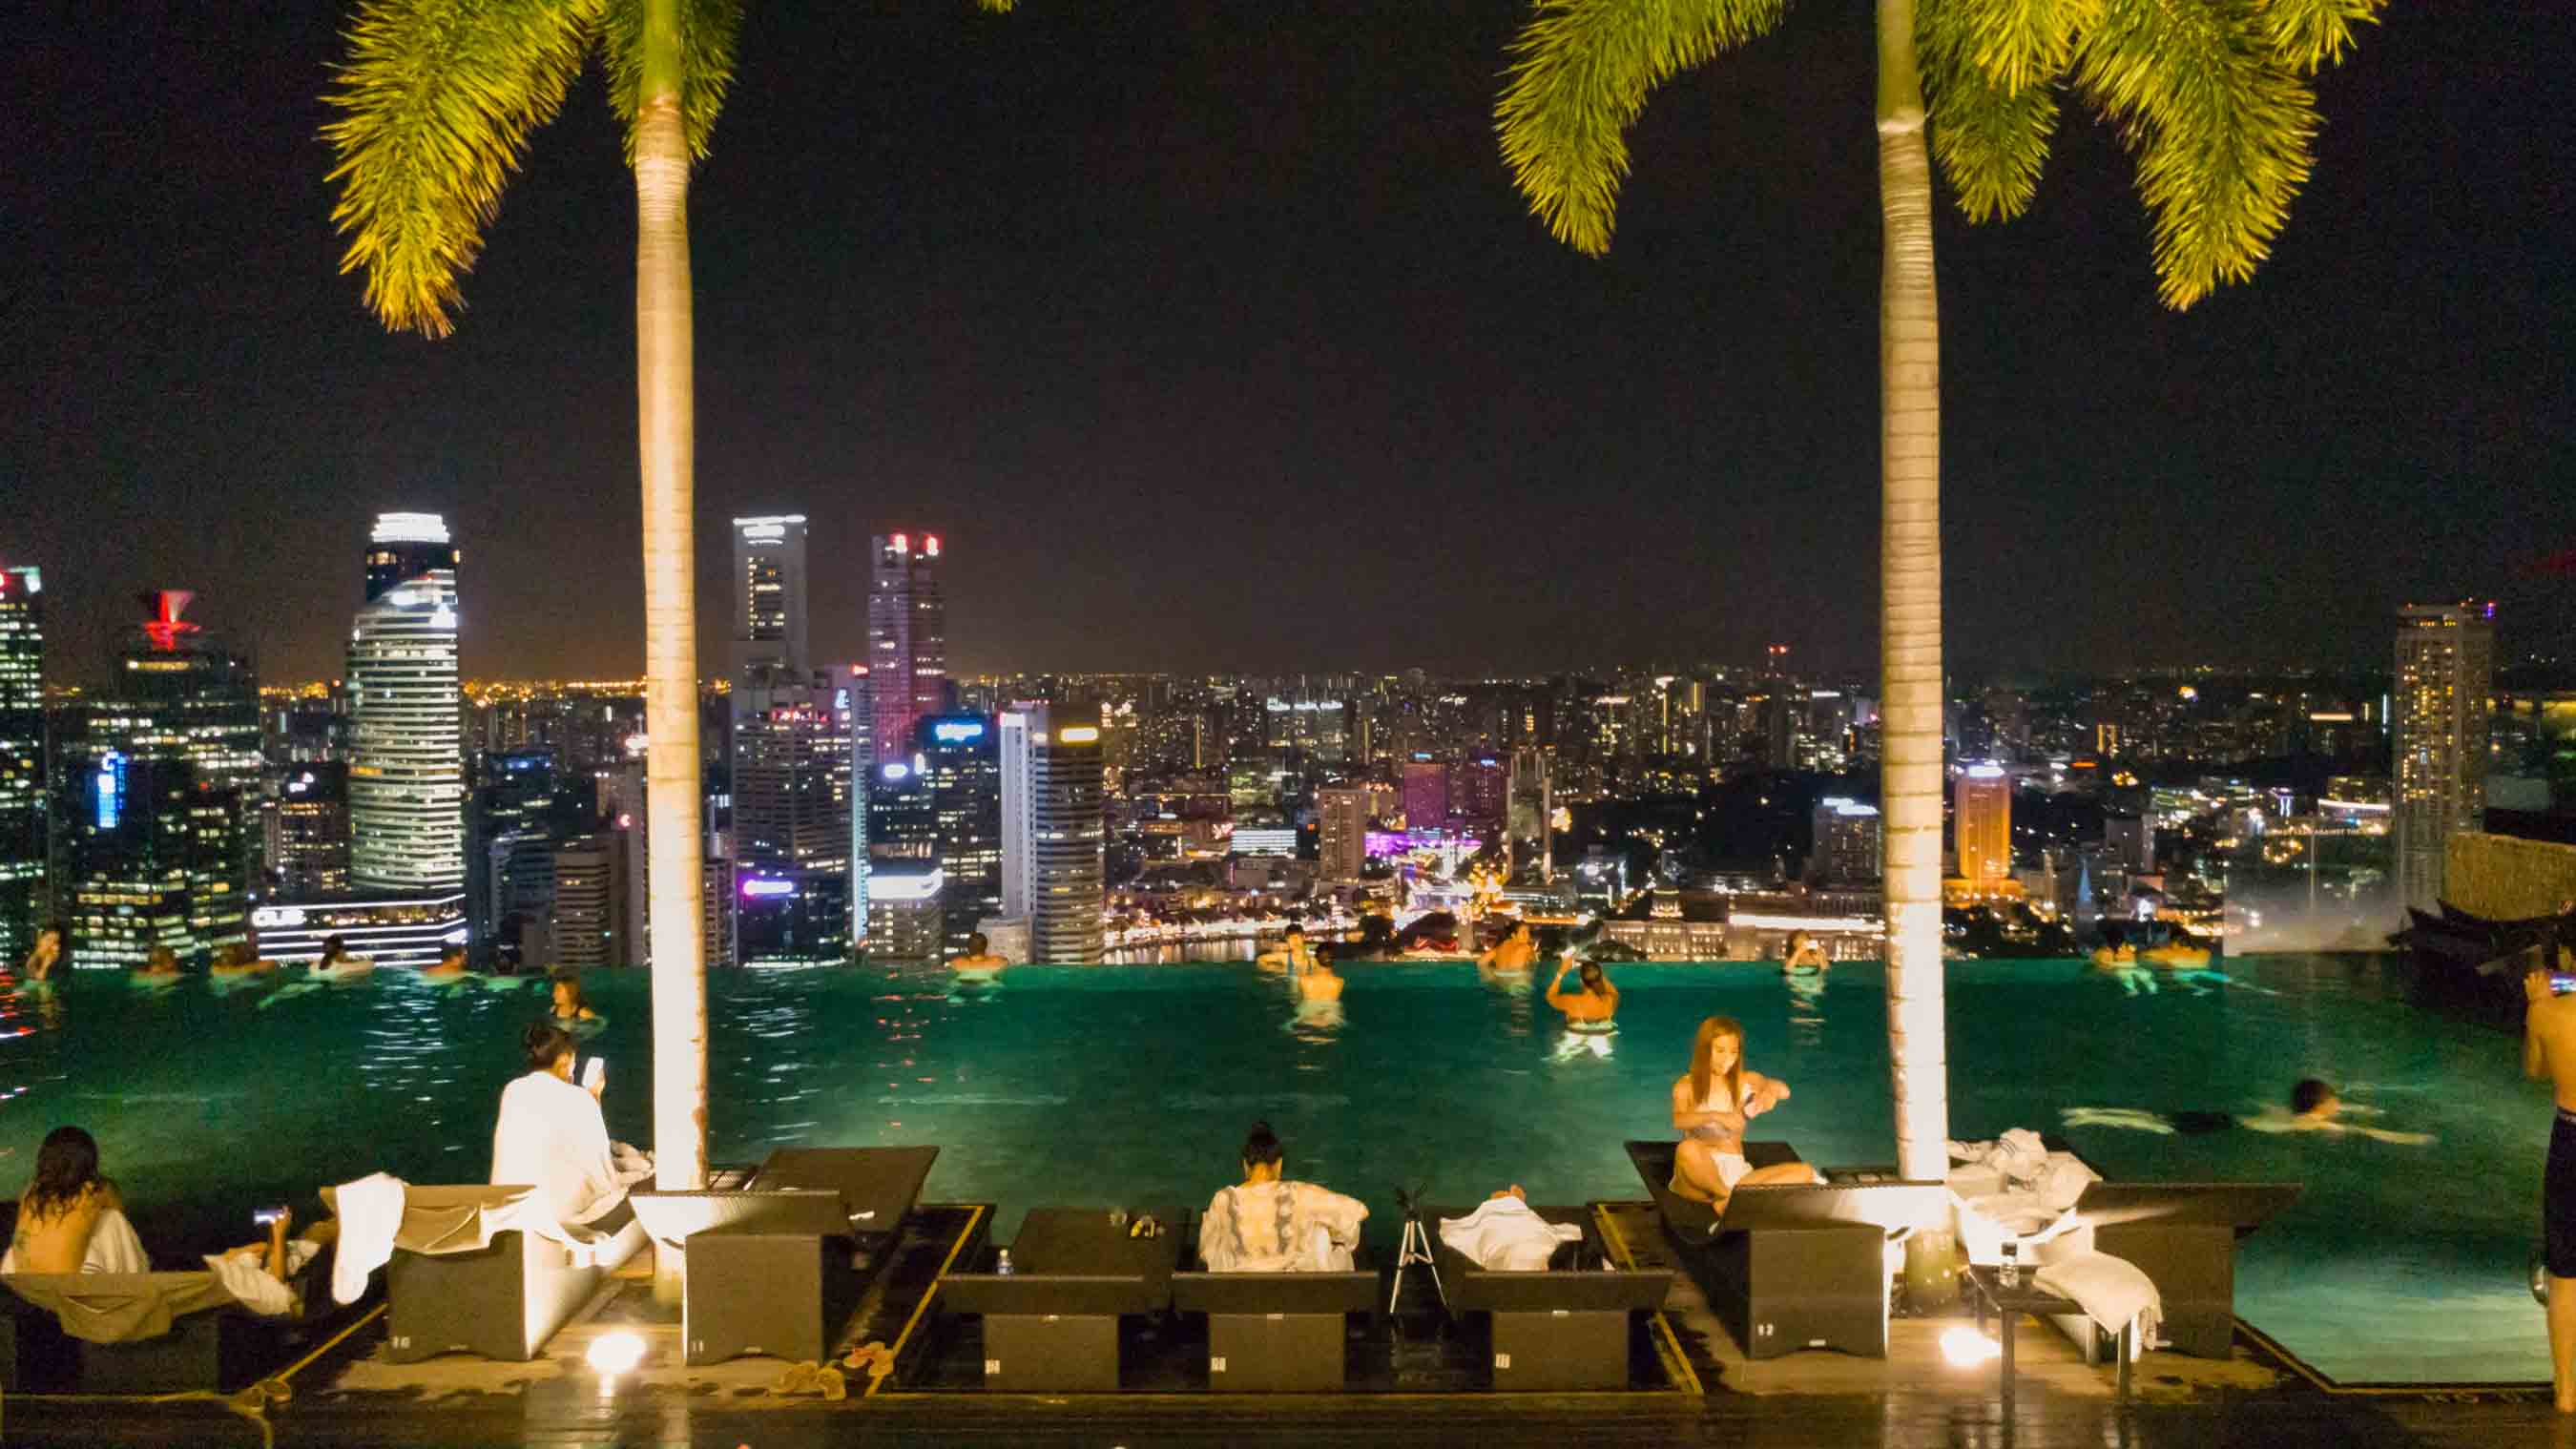 Singapore Pescart Enrico Pescantini Marina Bay Sands Hotel Infinity Pool 2